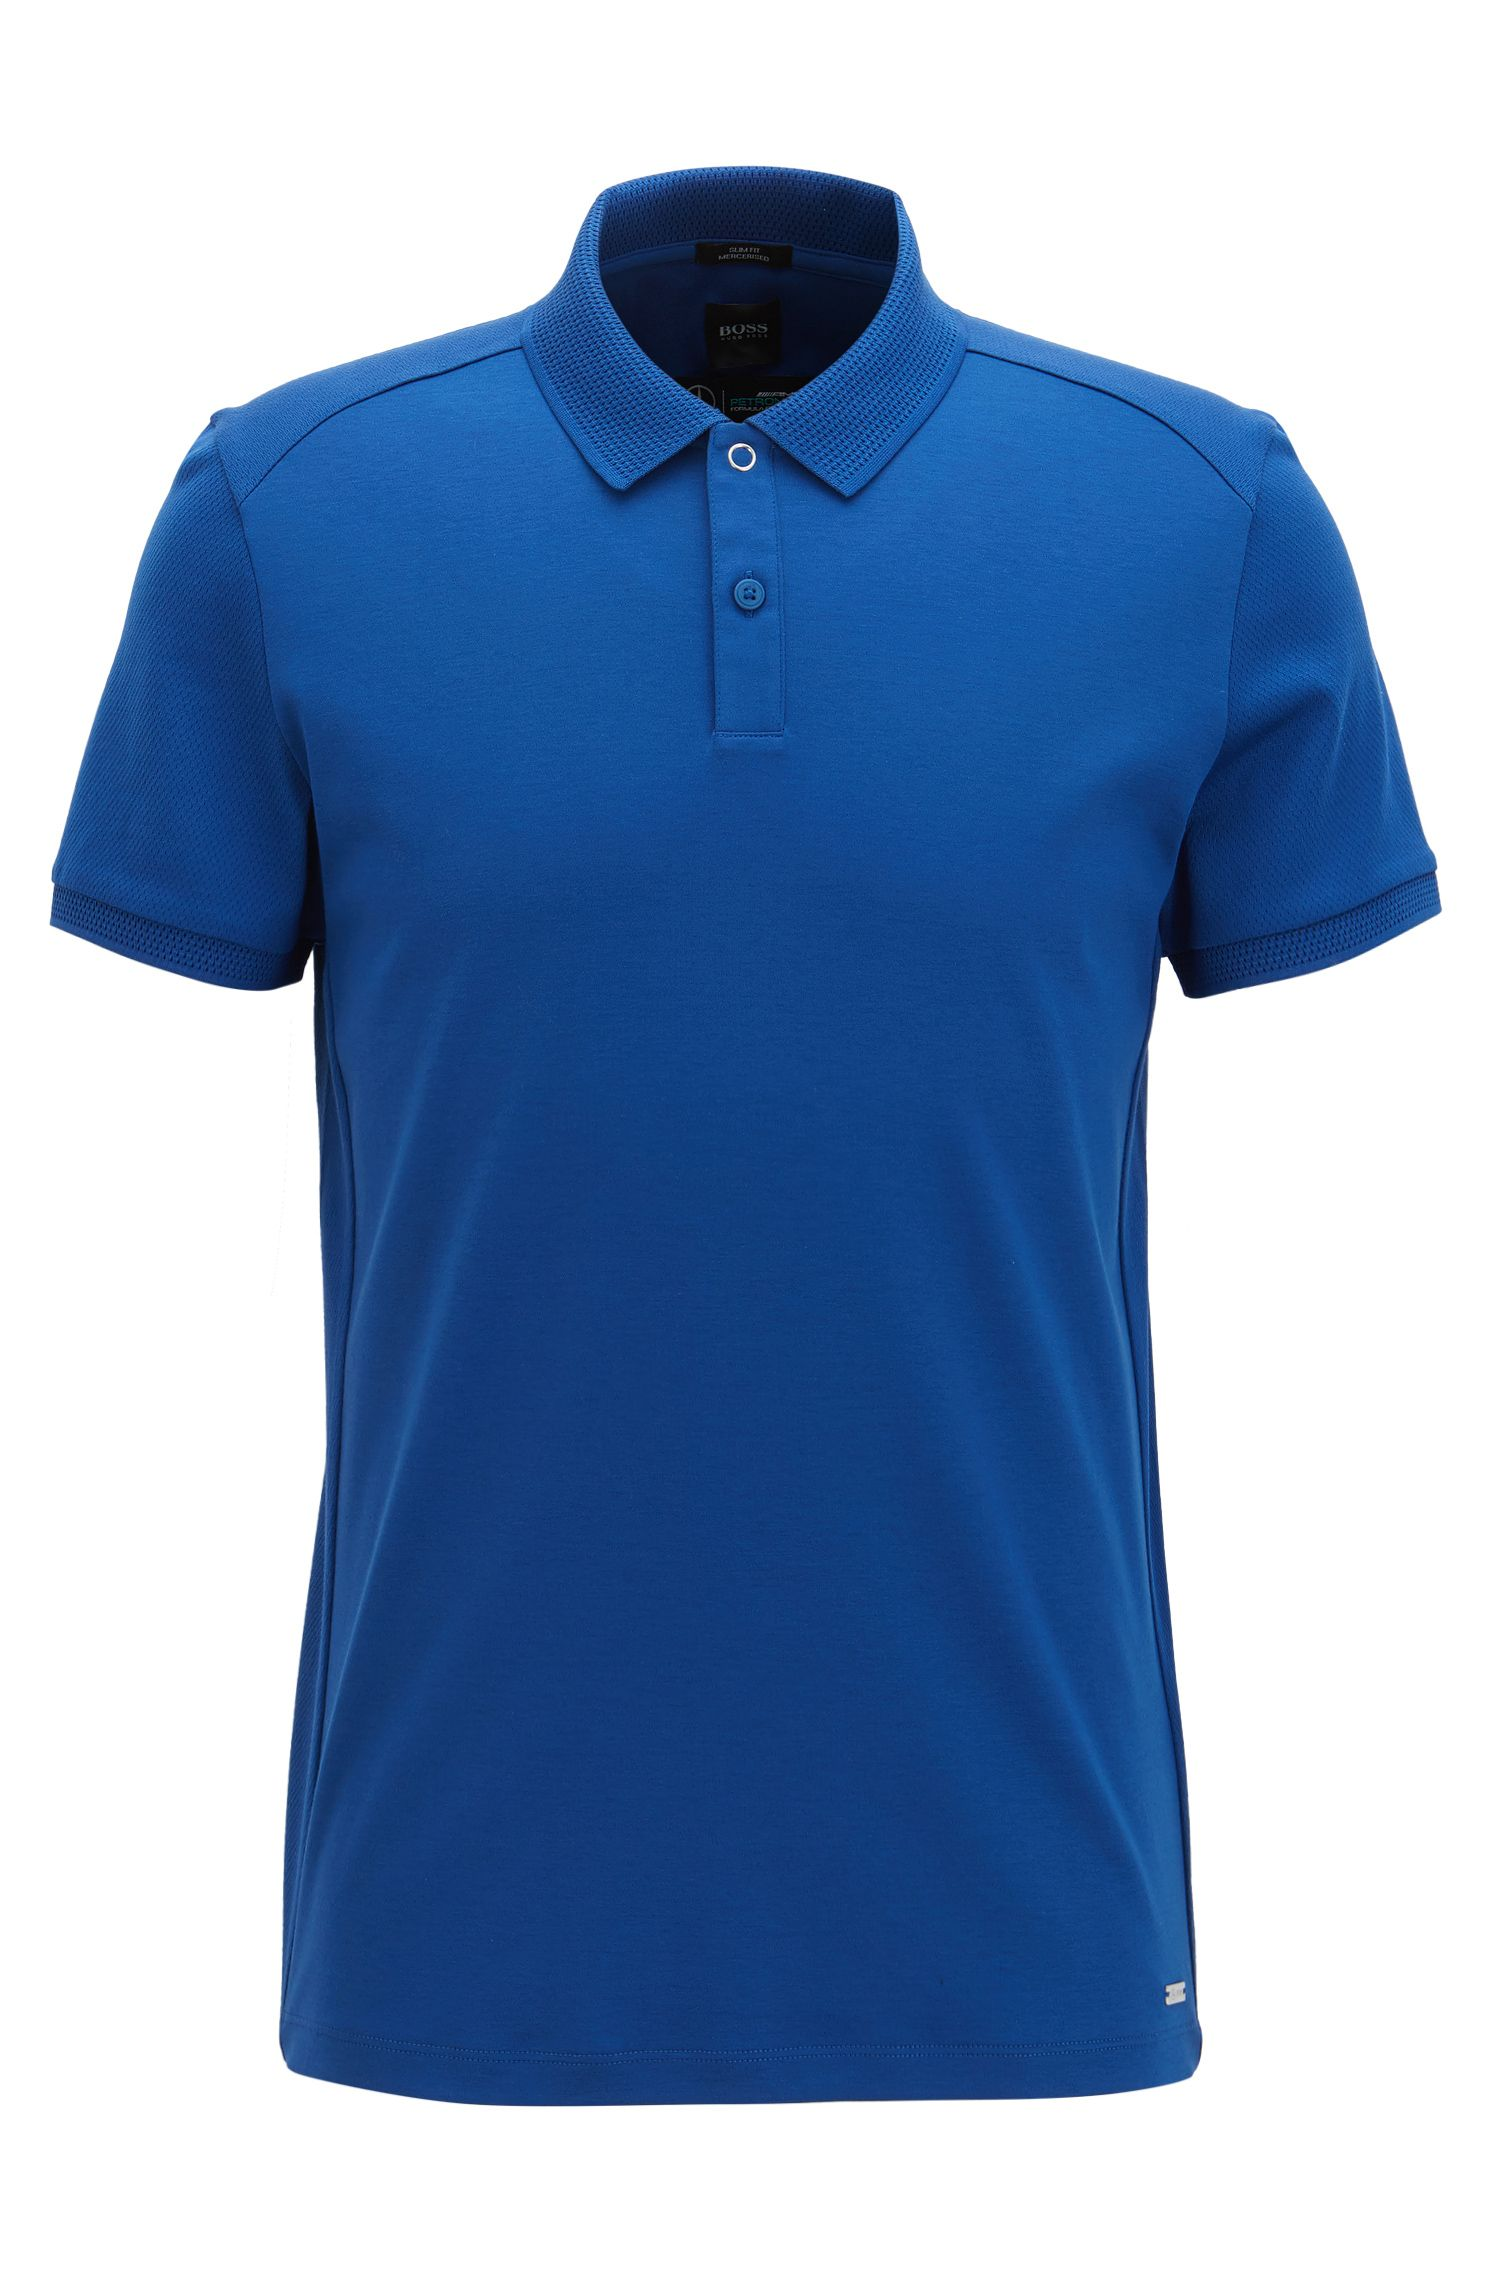 Mercedes-Benz Mercerized Cotton Polo Shirt, Slim Fit | Pollard